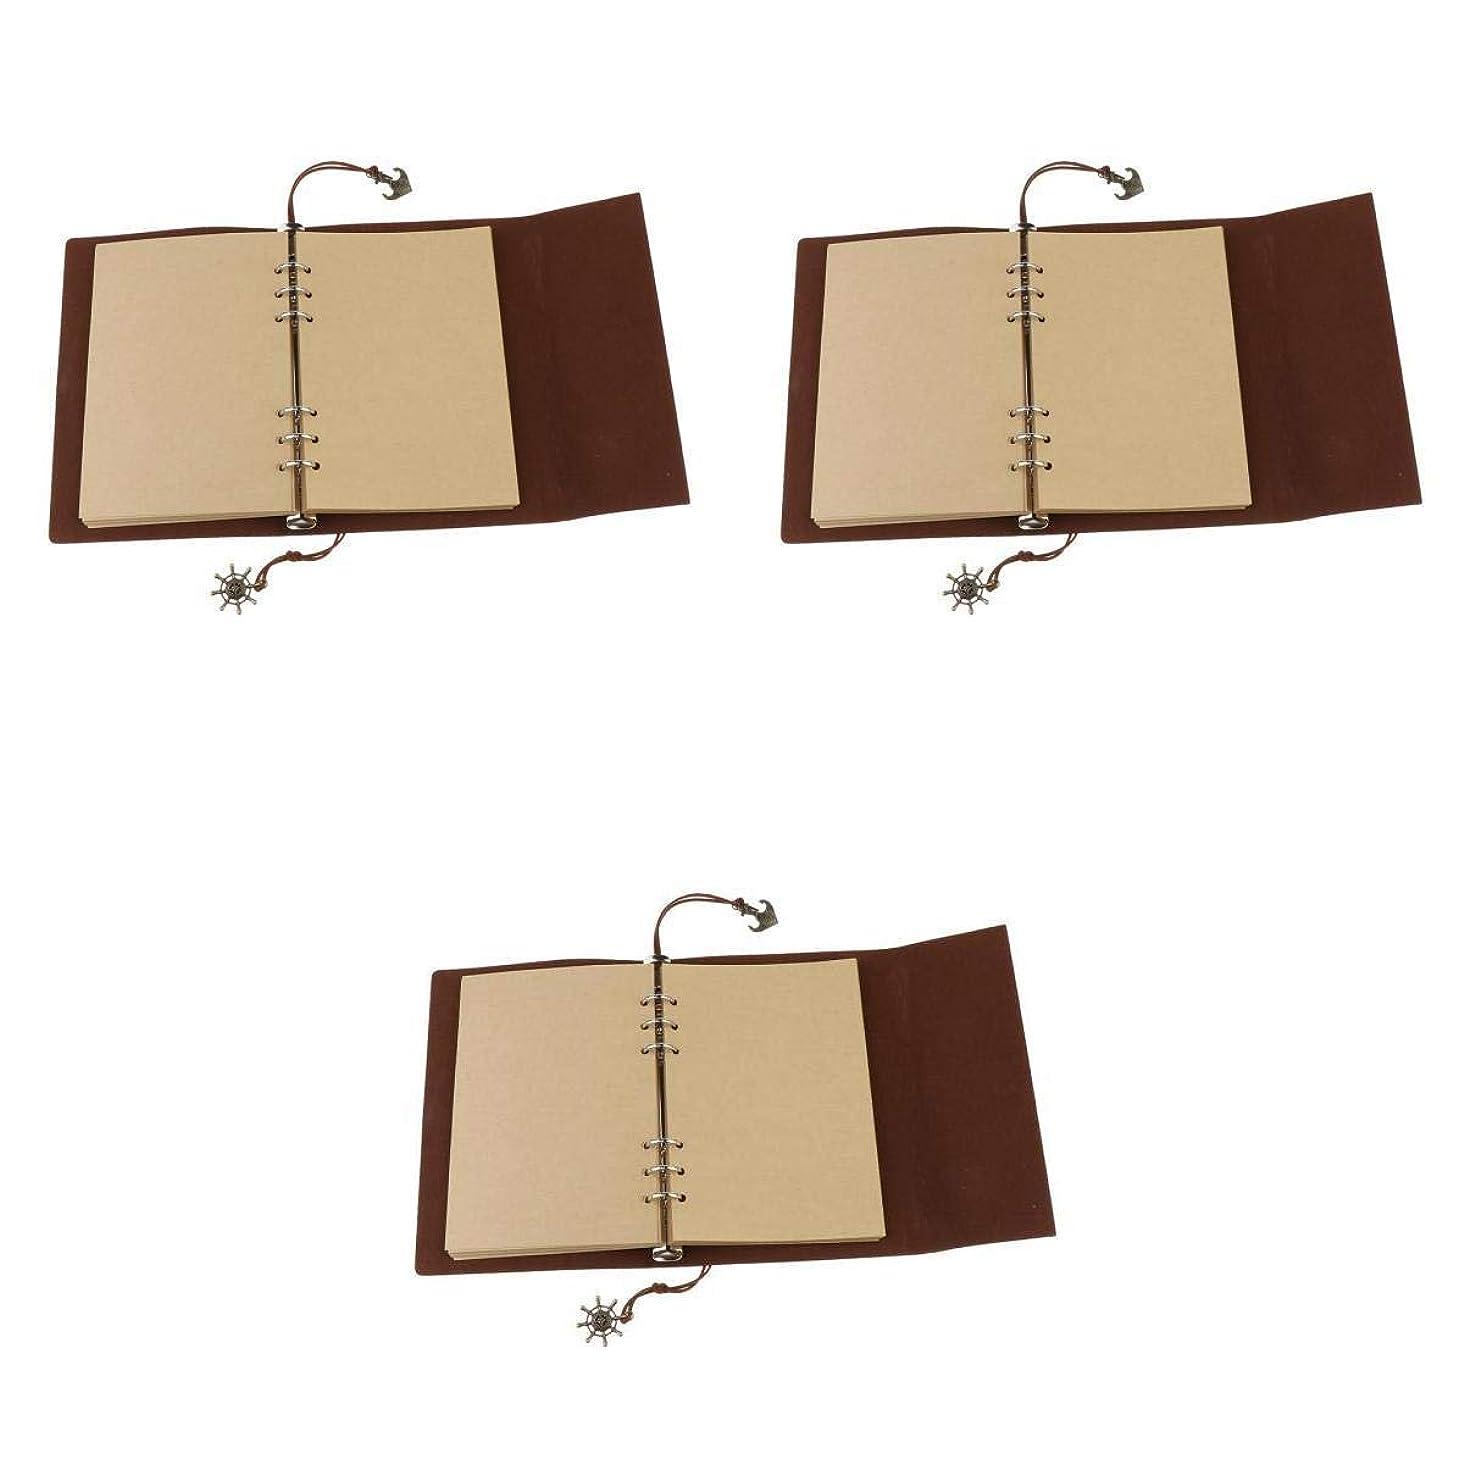 Fenteer A5ノート 旅行ノート 手帳ノート バインダー 空白 クラフト紙 持ち運び可能 80枚 3冊